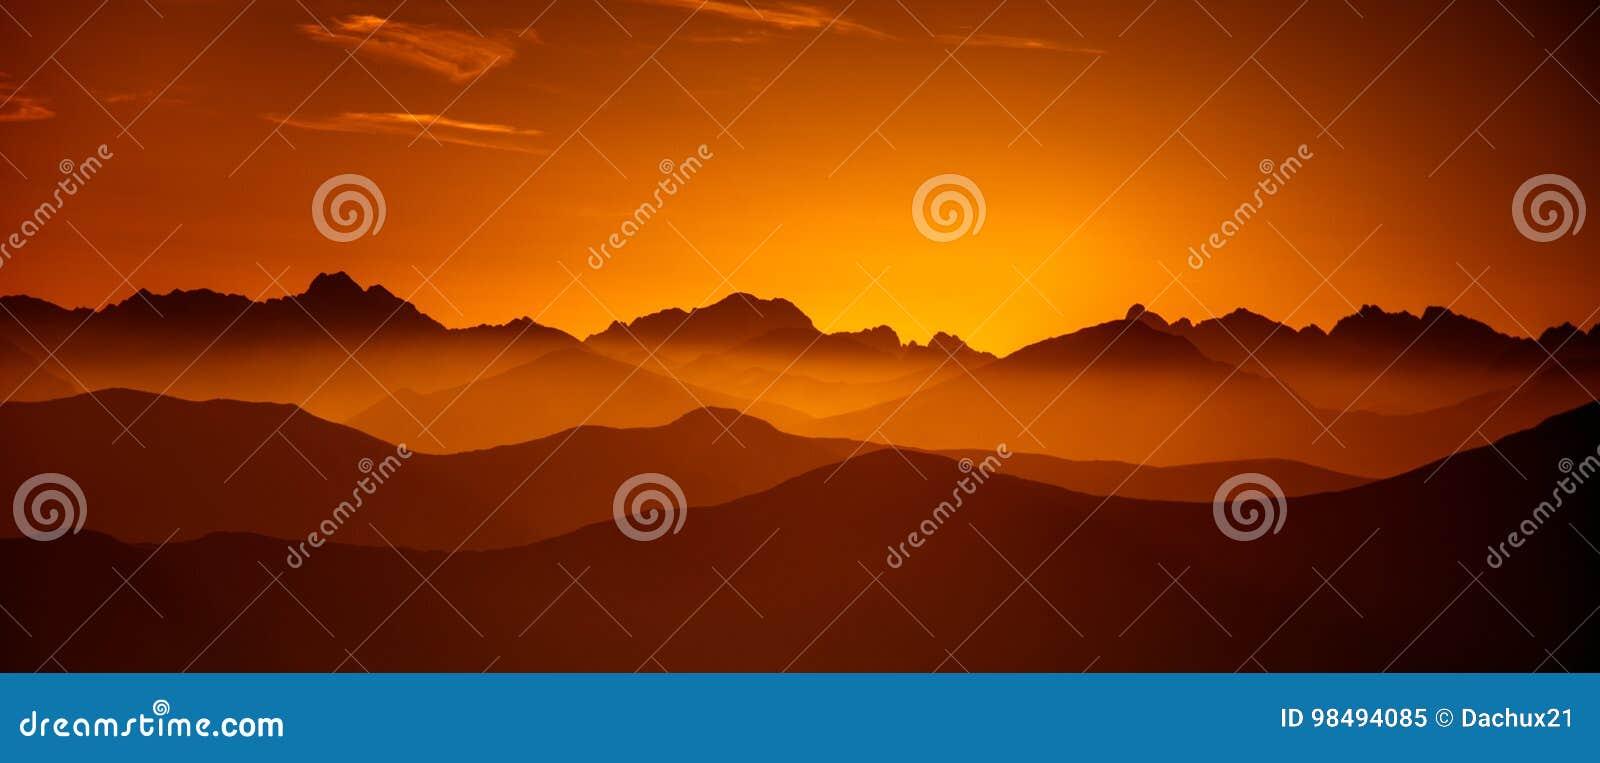 Download Красивый взгляд перспективы над горами с градиентом Стоковое Изображение - изображение насчитывающей зига, панорамно: 98494085